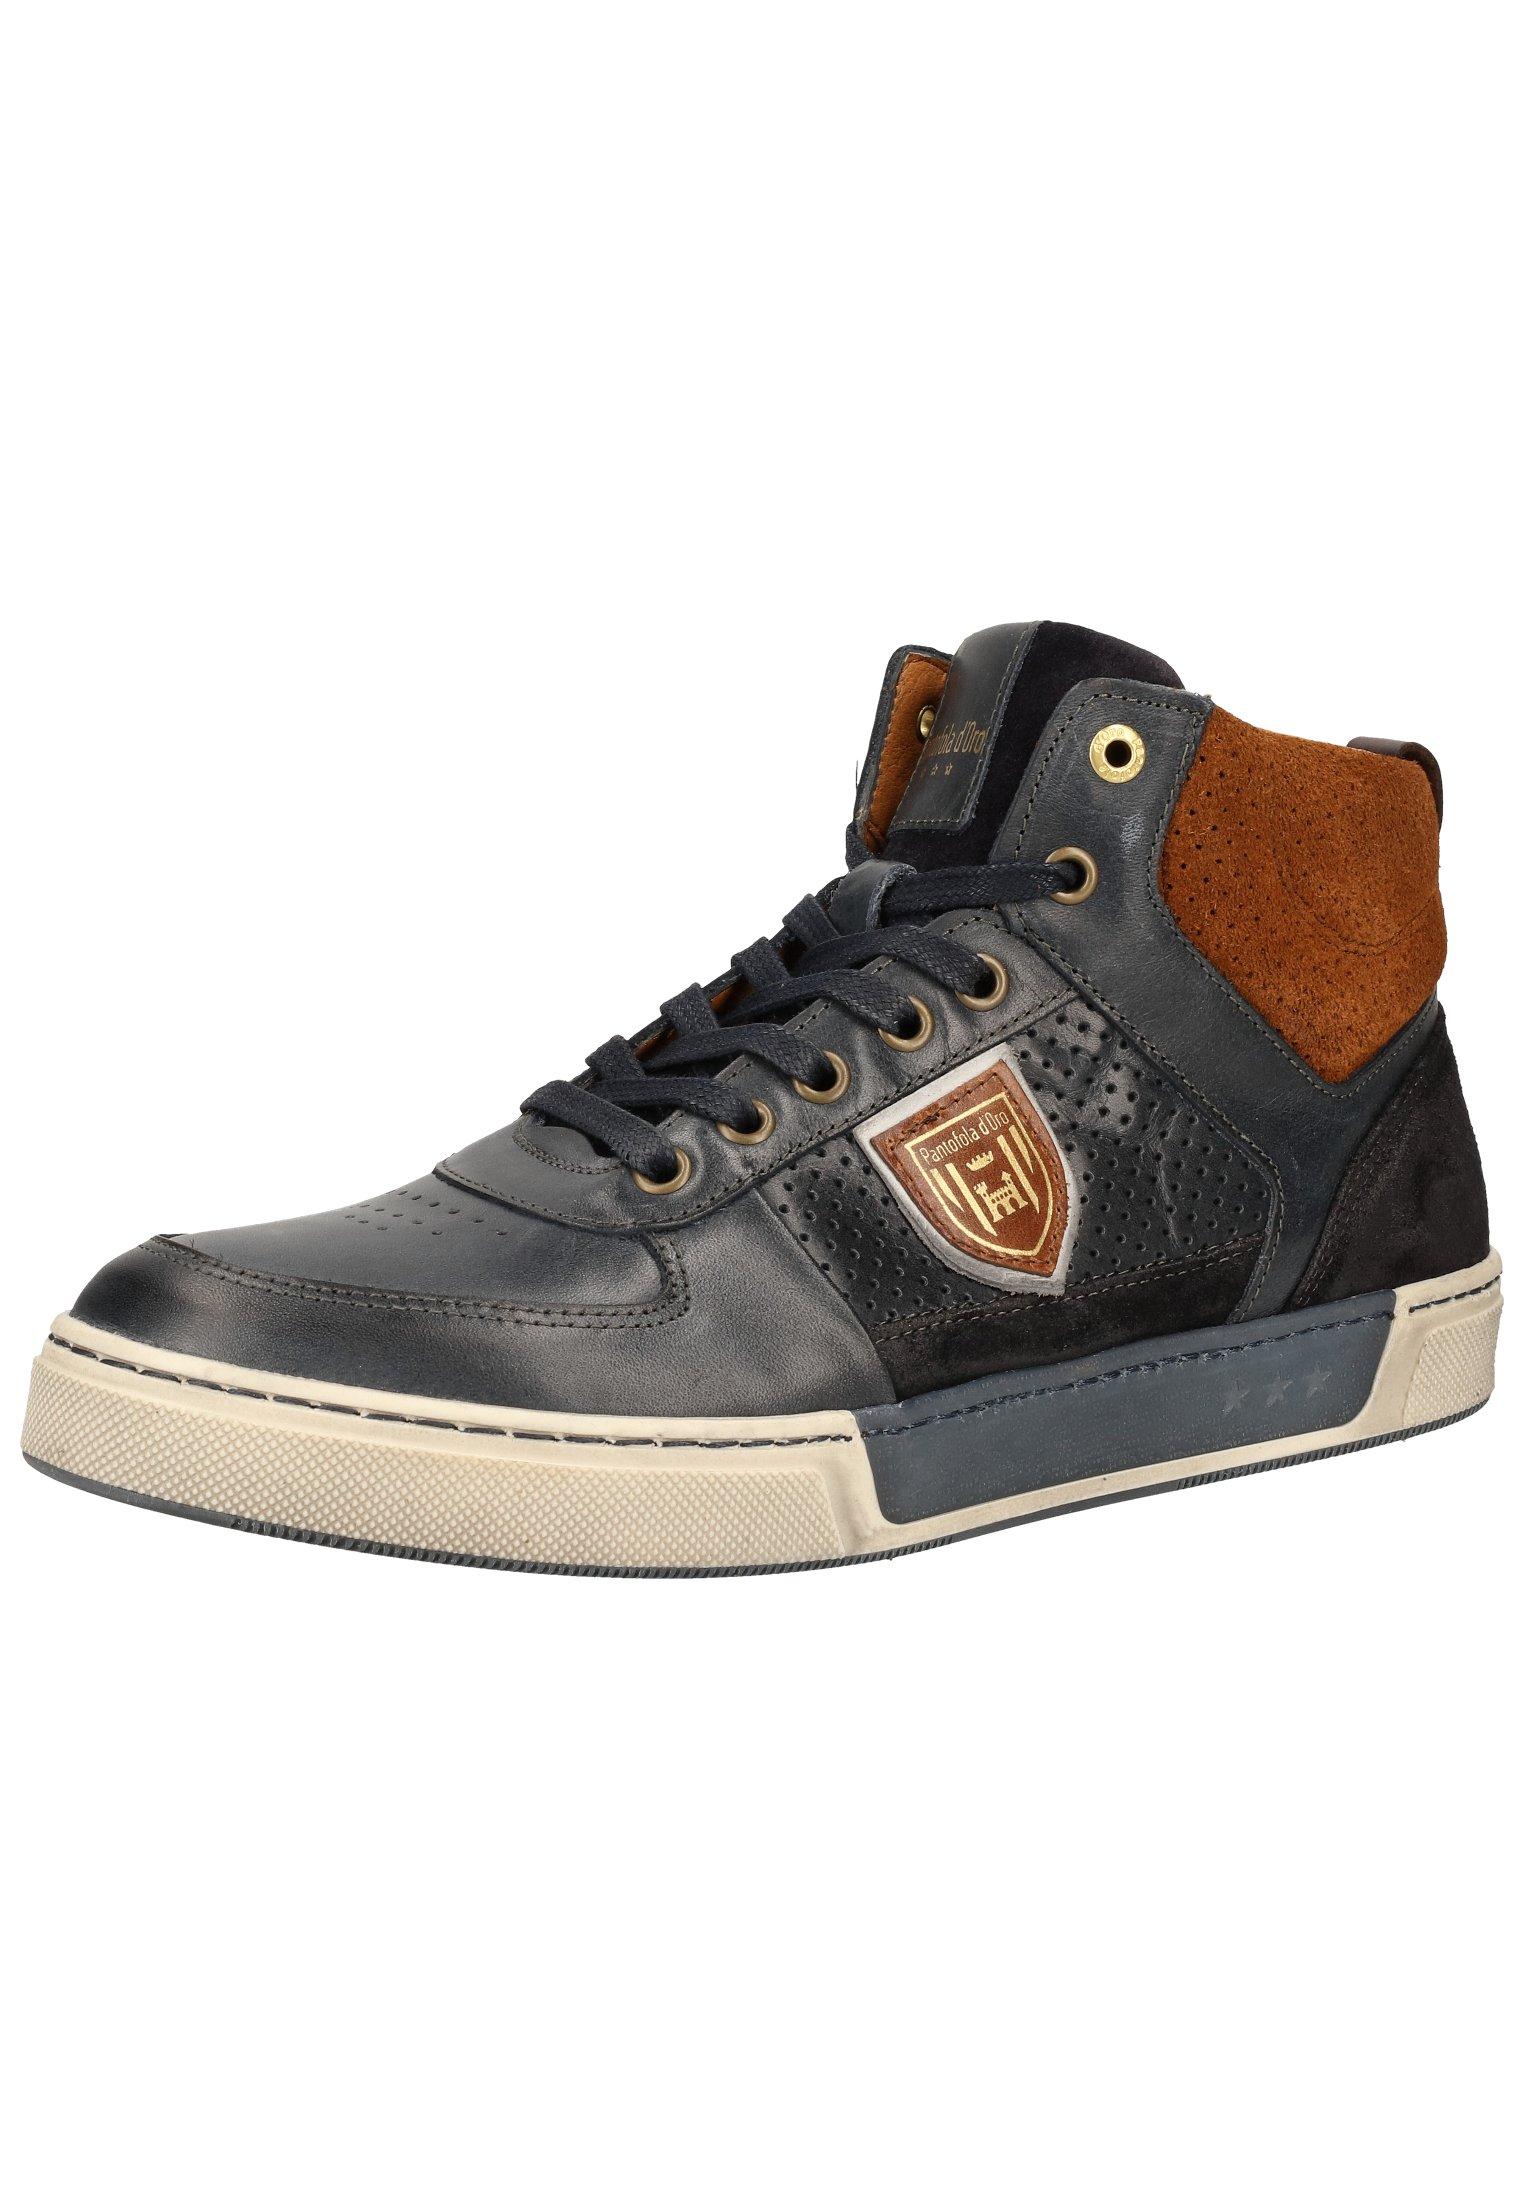 Pantofola dOro Sneaker high - dress blues 29y/dunkelblau - Herrenschuhe kijPb